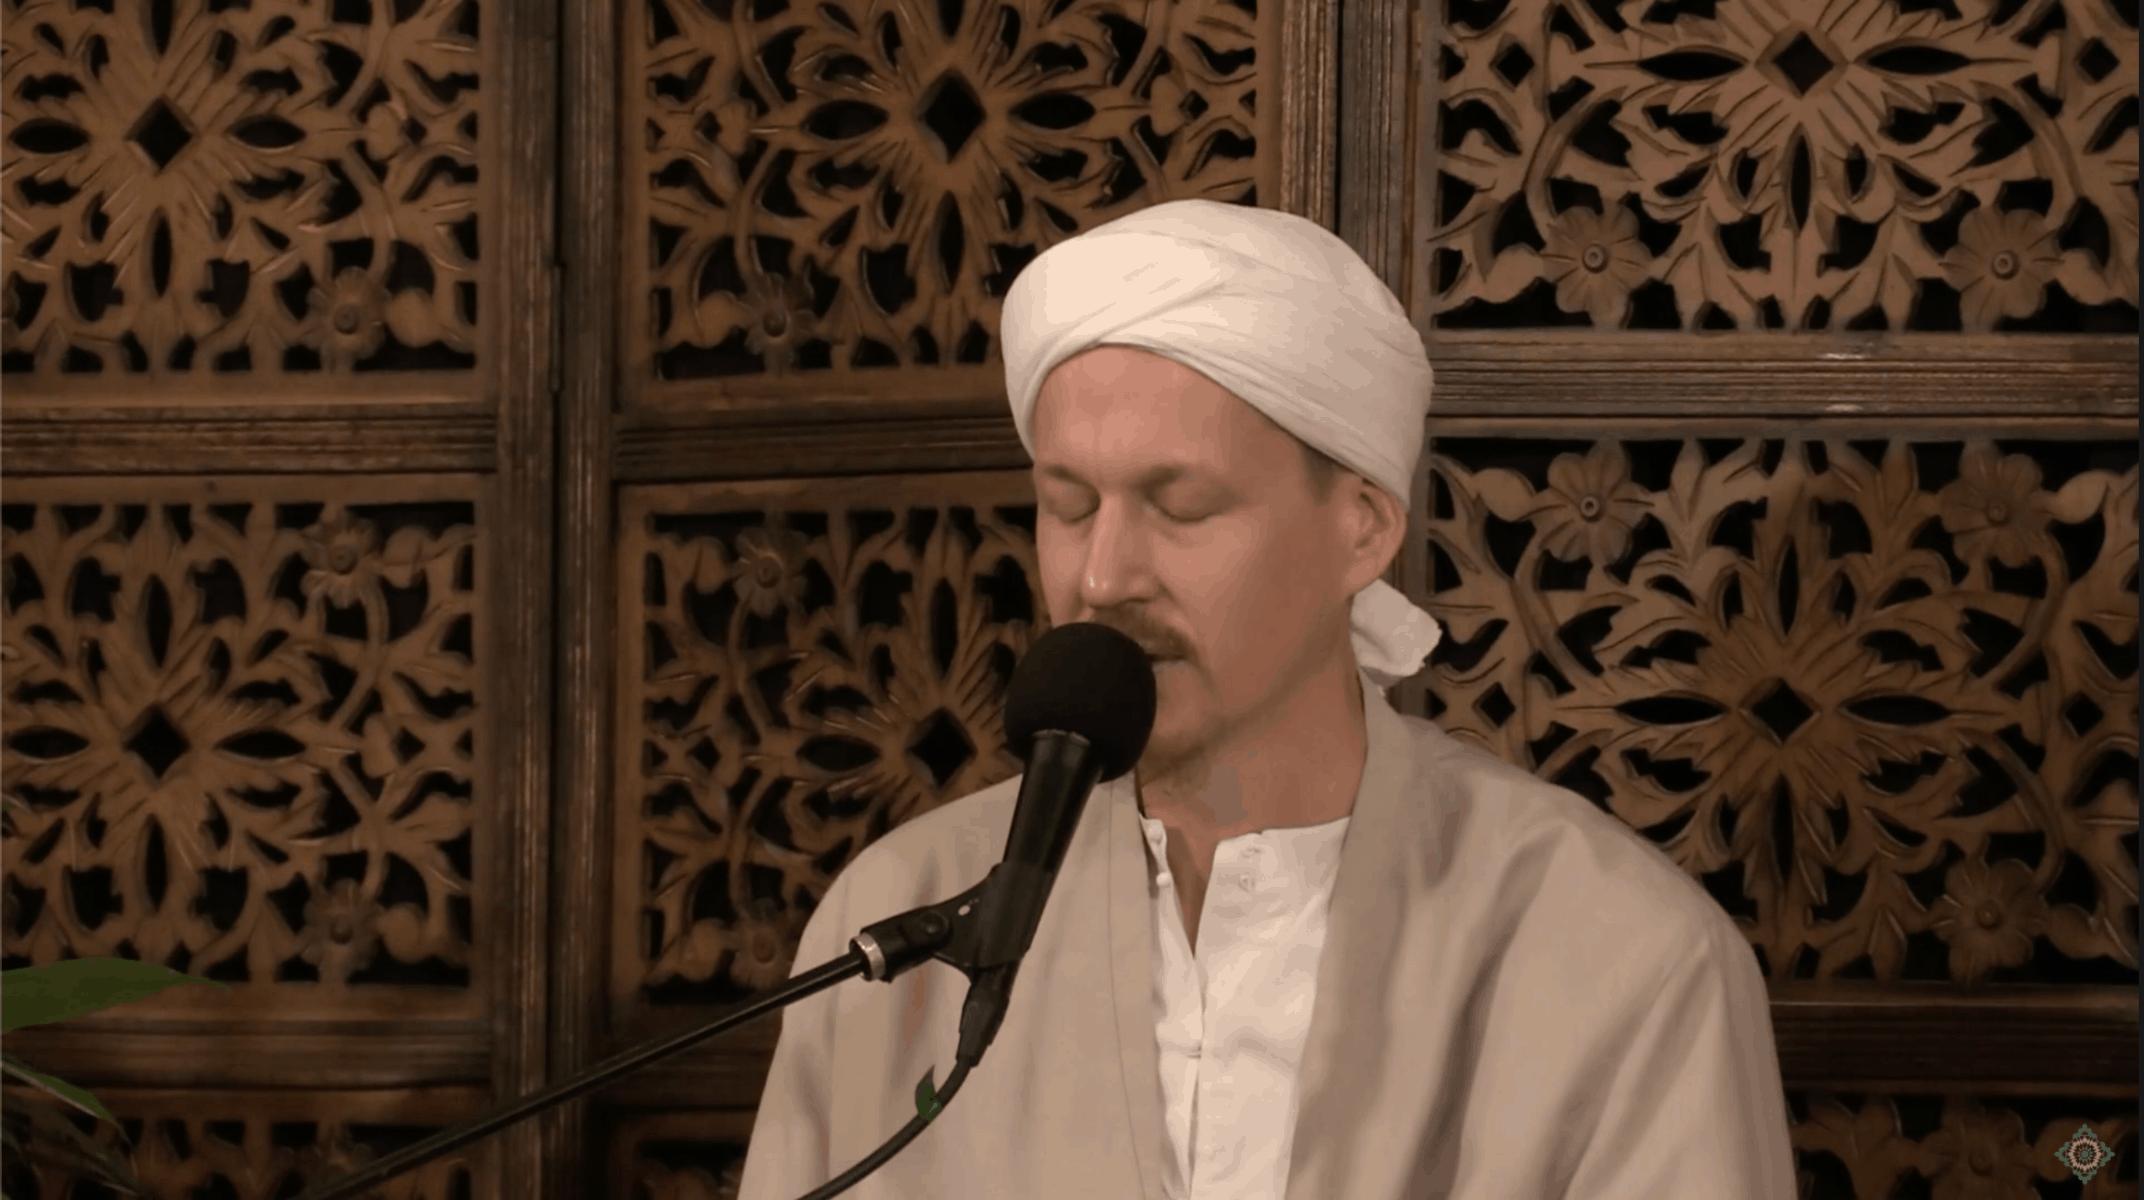 Yahya Rhodus – The Prophet Muhammad ﷺ: The Door to Allah